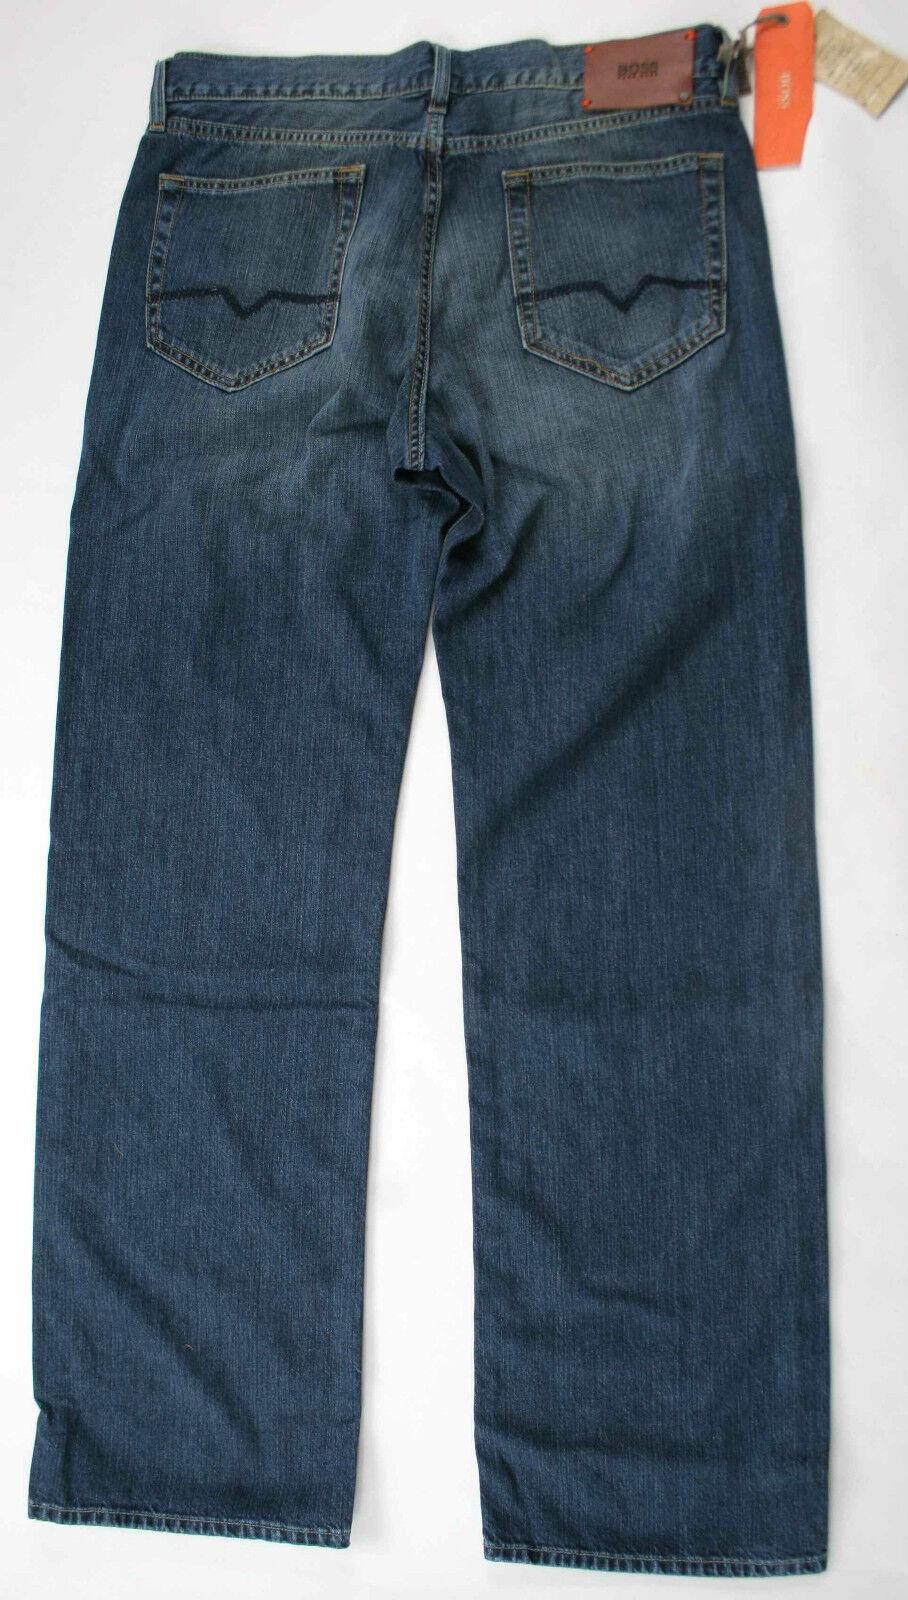 Hugo Boss Jeans Comfort Fit  HB67  30